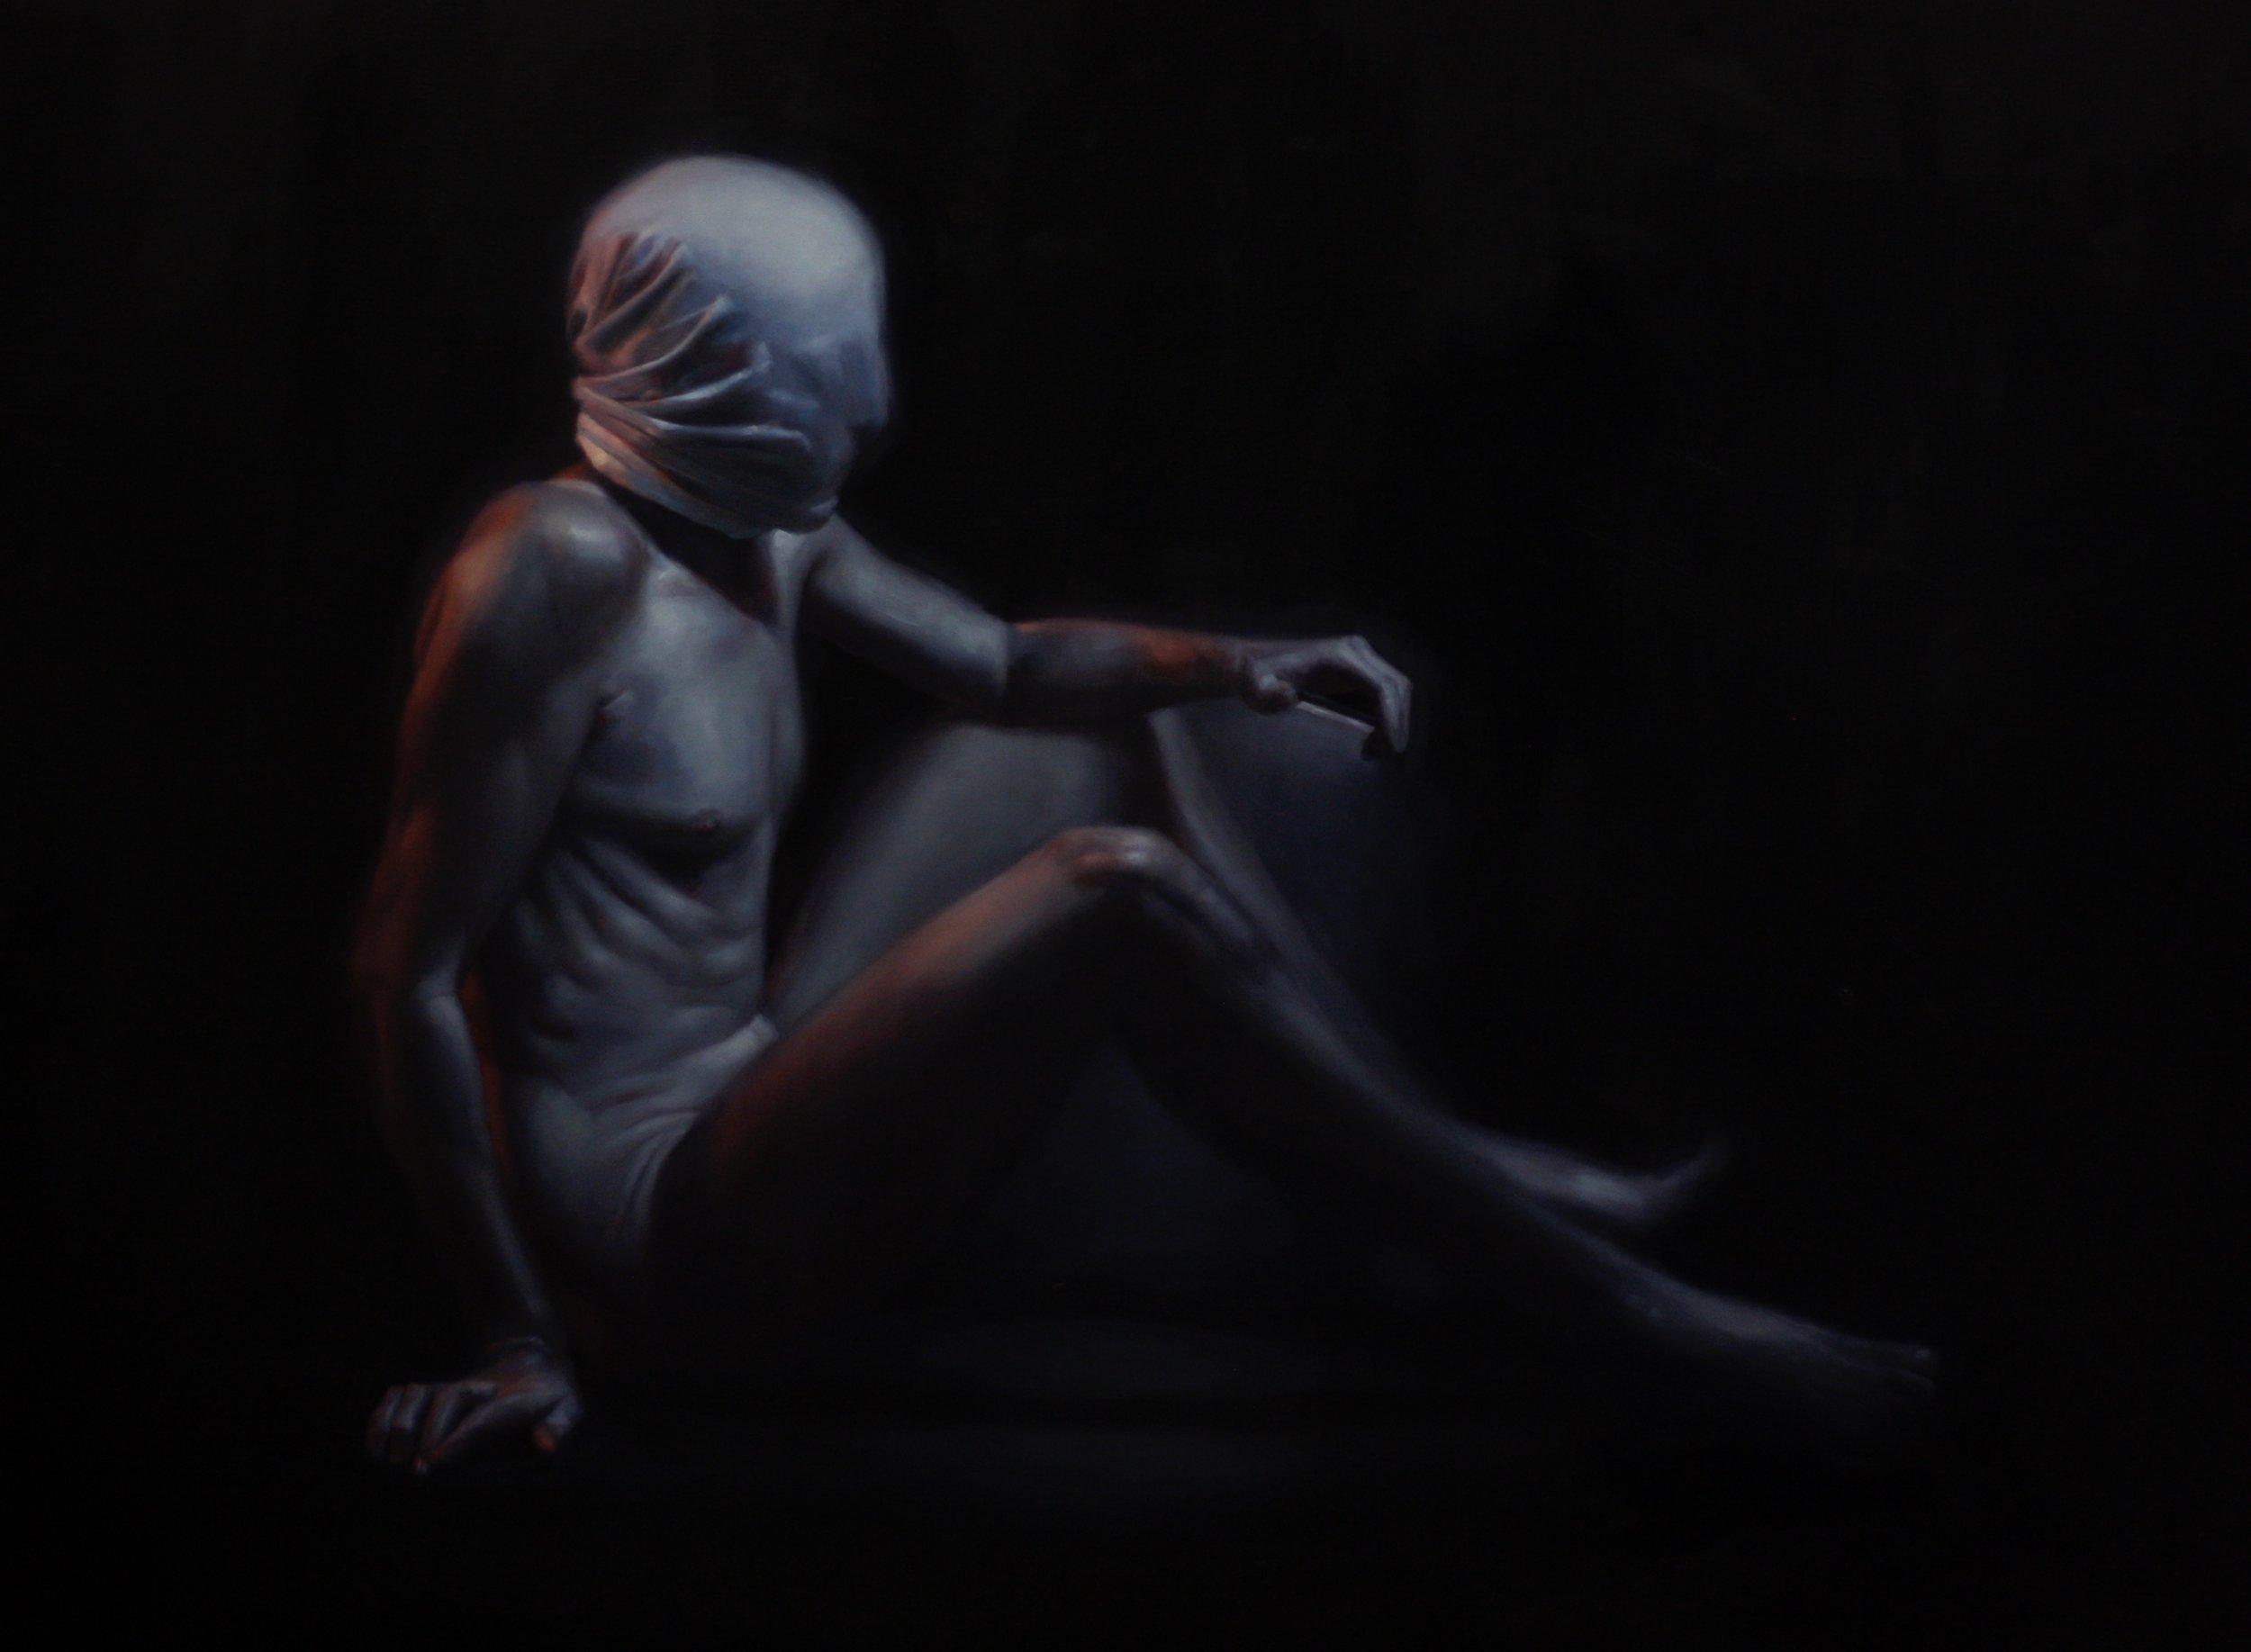 'Hostage' | oil on canvas | 91.5 x 122 cm